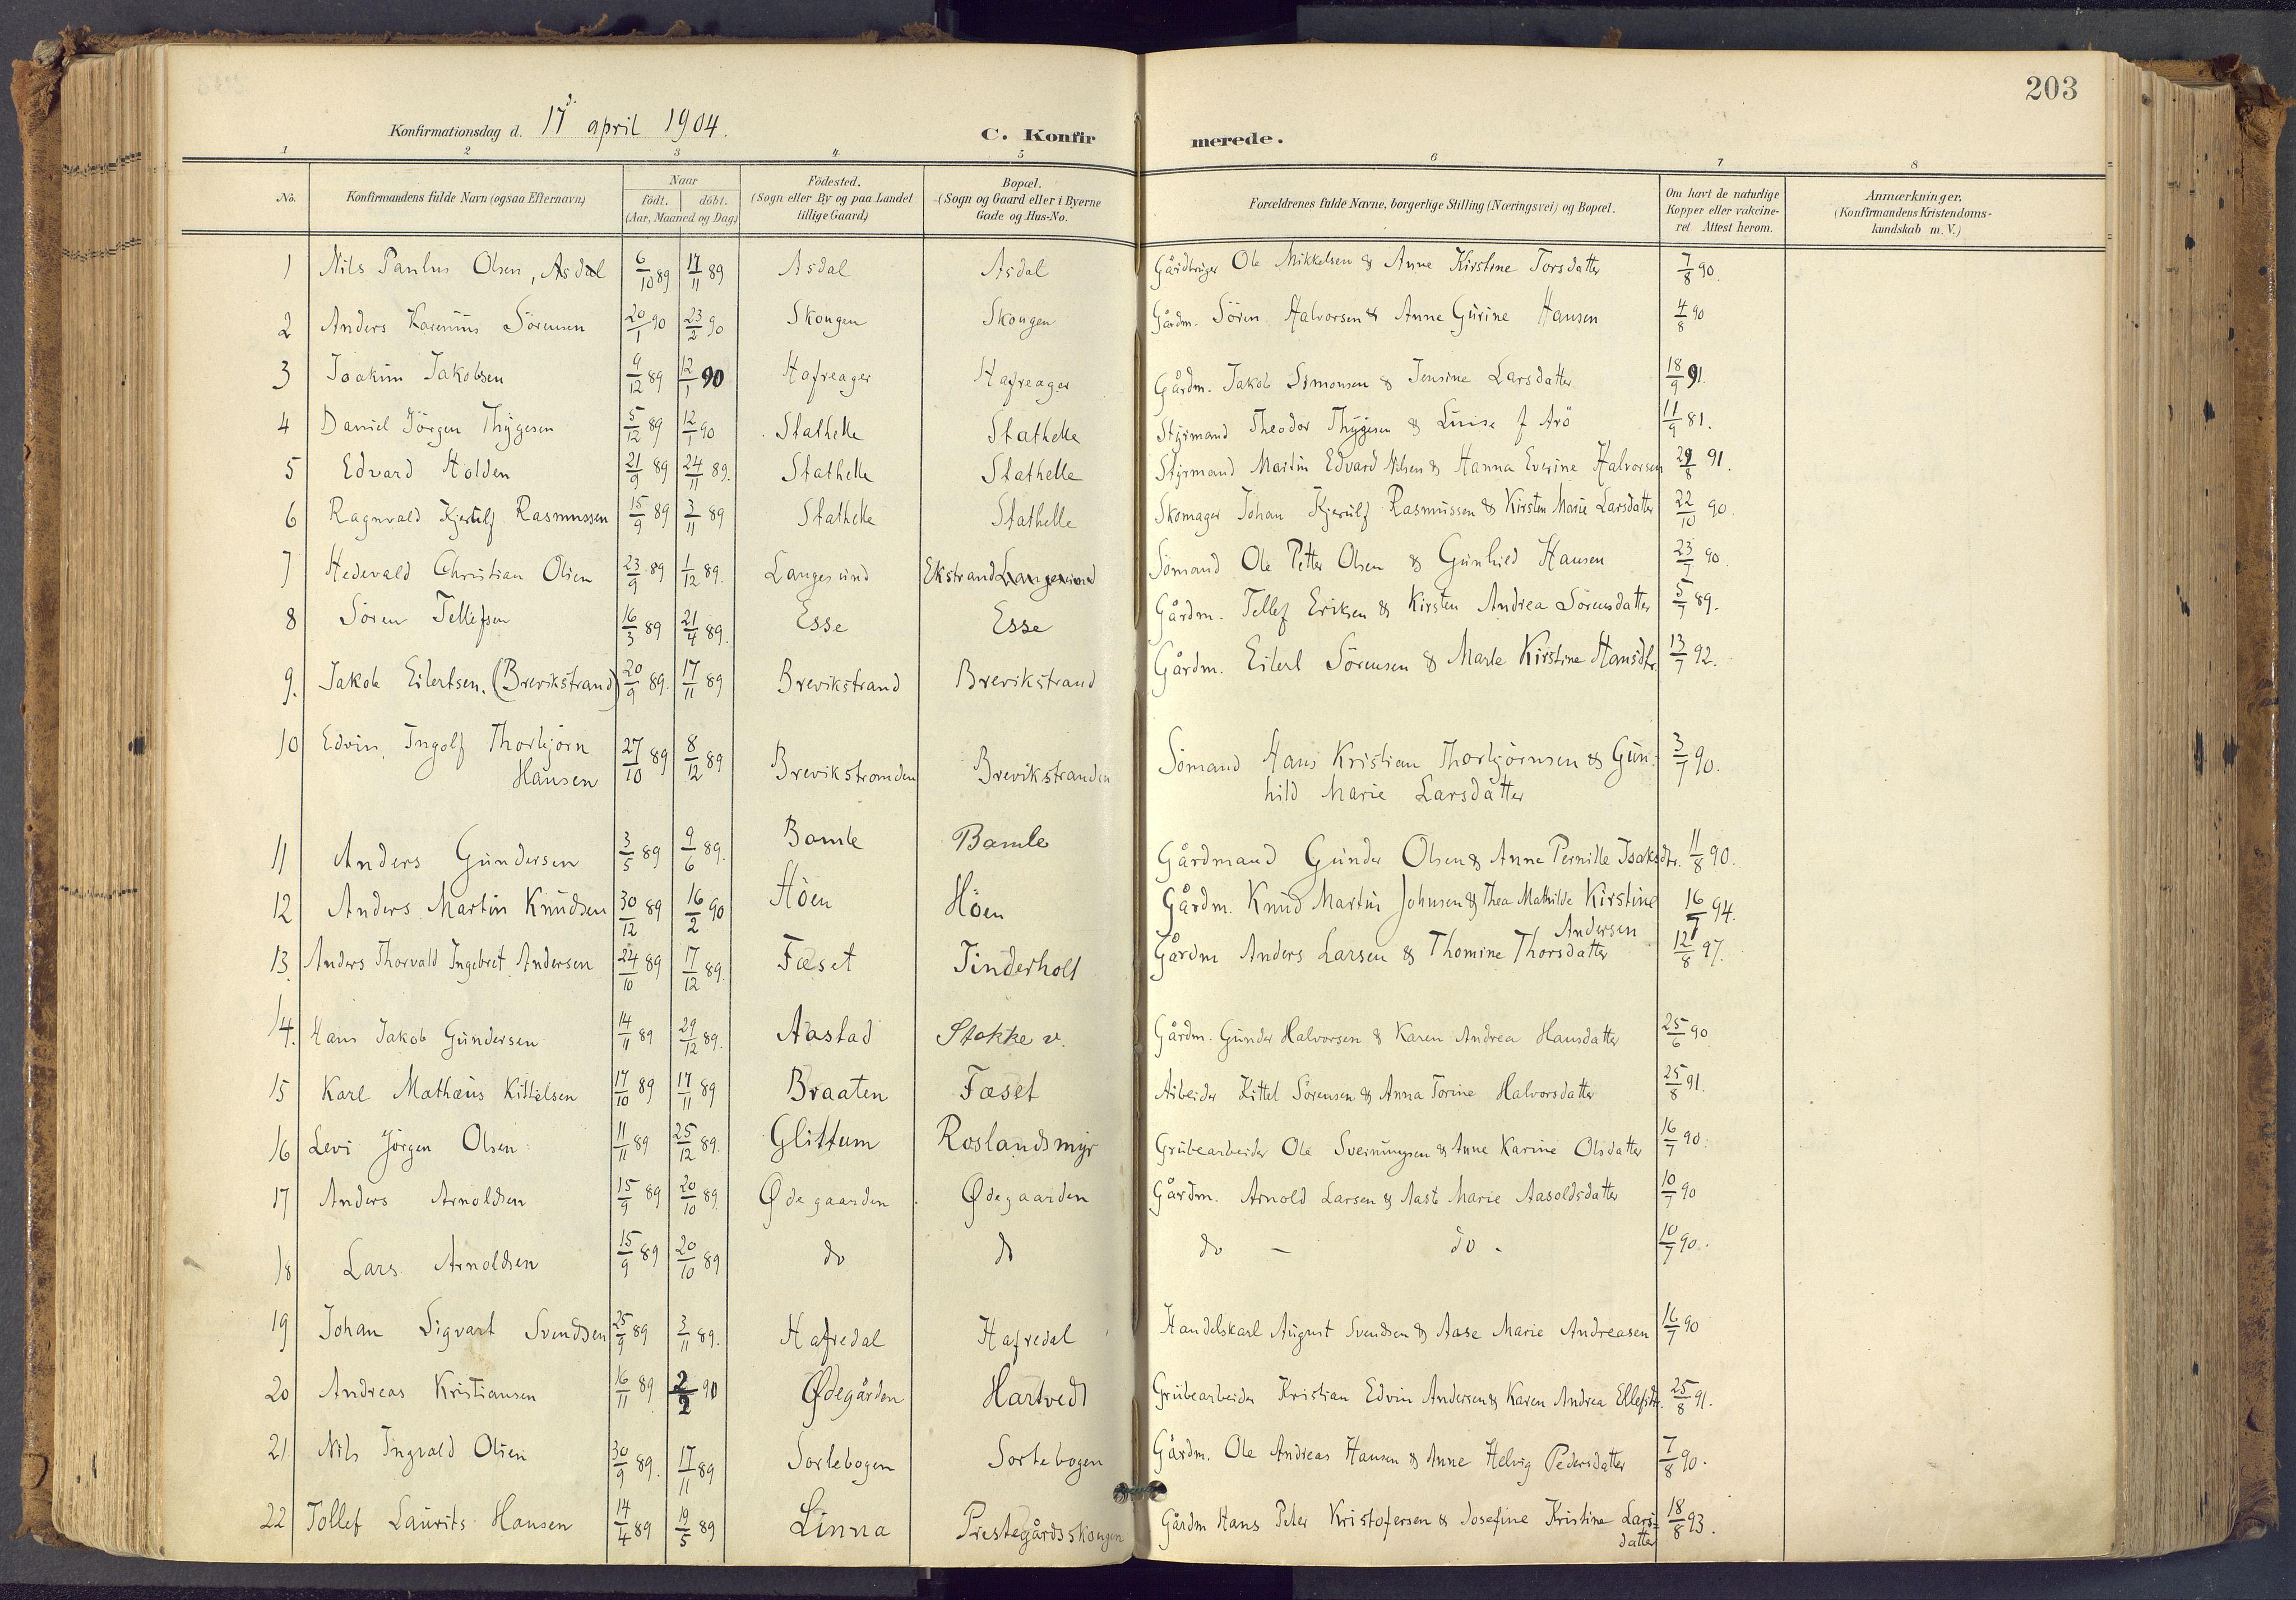 SAKO, Bamble kirkebøker, F/Fa/L0009: Ministerialbok nr. I 9, 1901-1917, s. 203